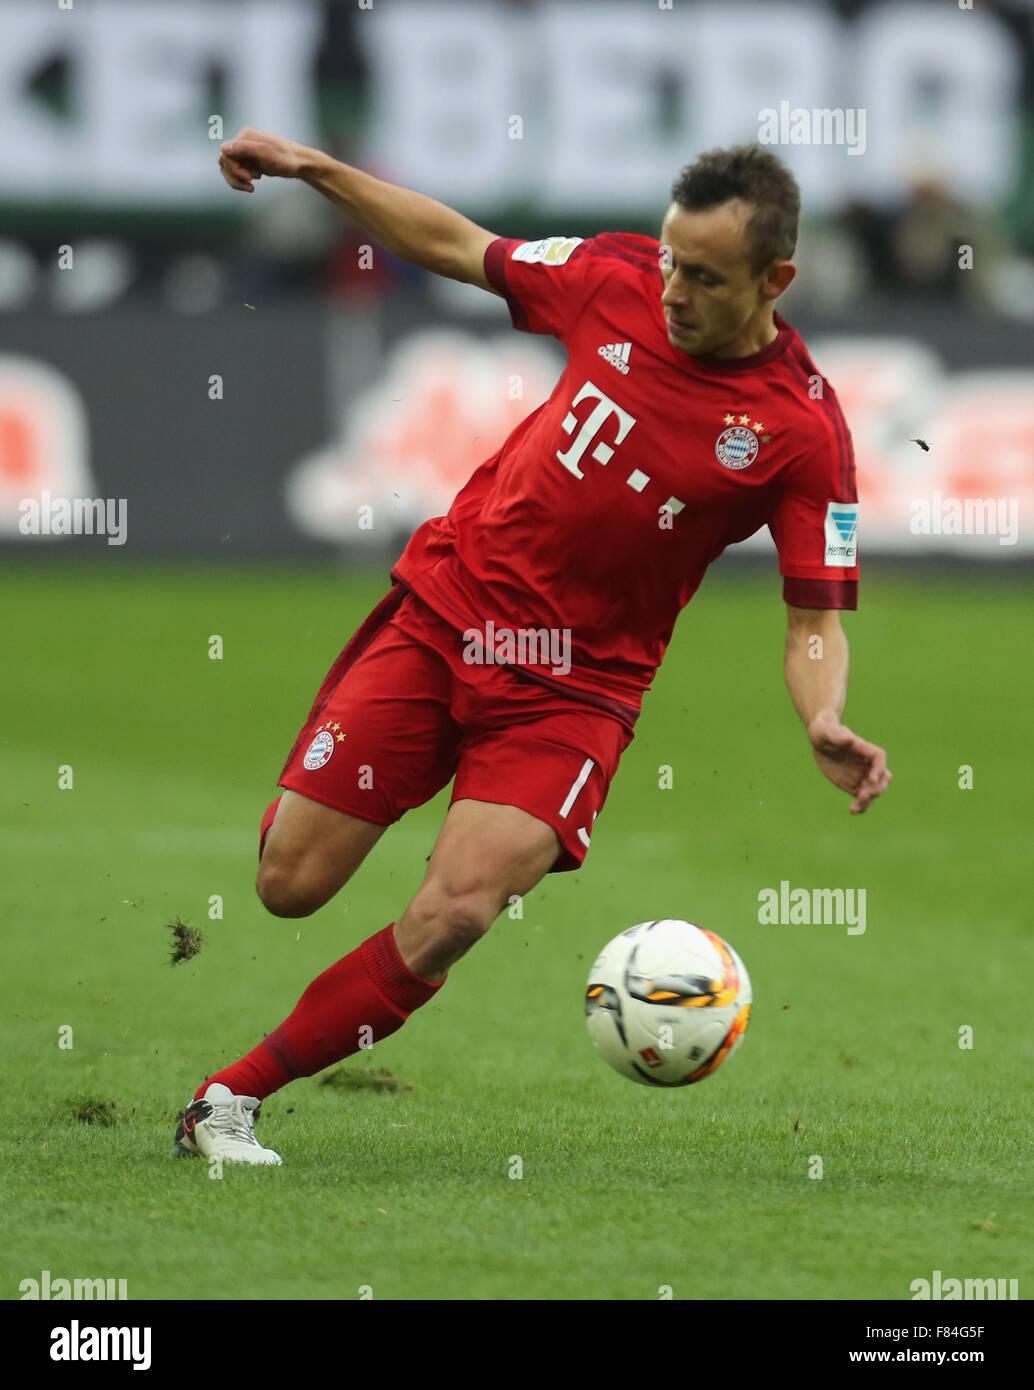 Germany, Bandesliga, Borussia Moenchengladbach vs Bayern Muenchen, Moenchengladbach, 05.12.2015: Rafinha (Muenchen) - Stock Image